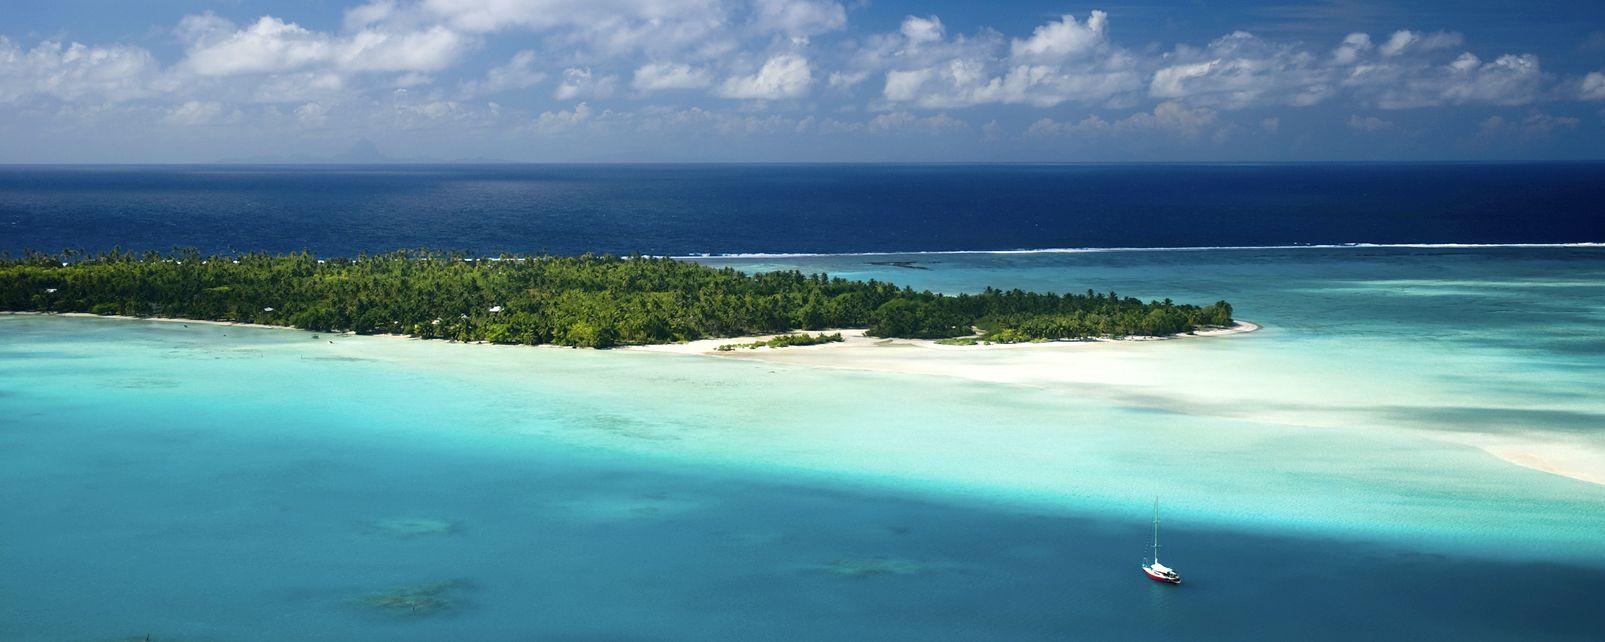 L 238 Le De Maupiti Tahiti Et L Archipel De La Soci 233 T 233 Polyn 233 Sie